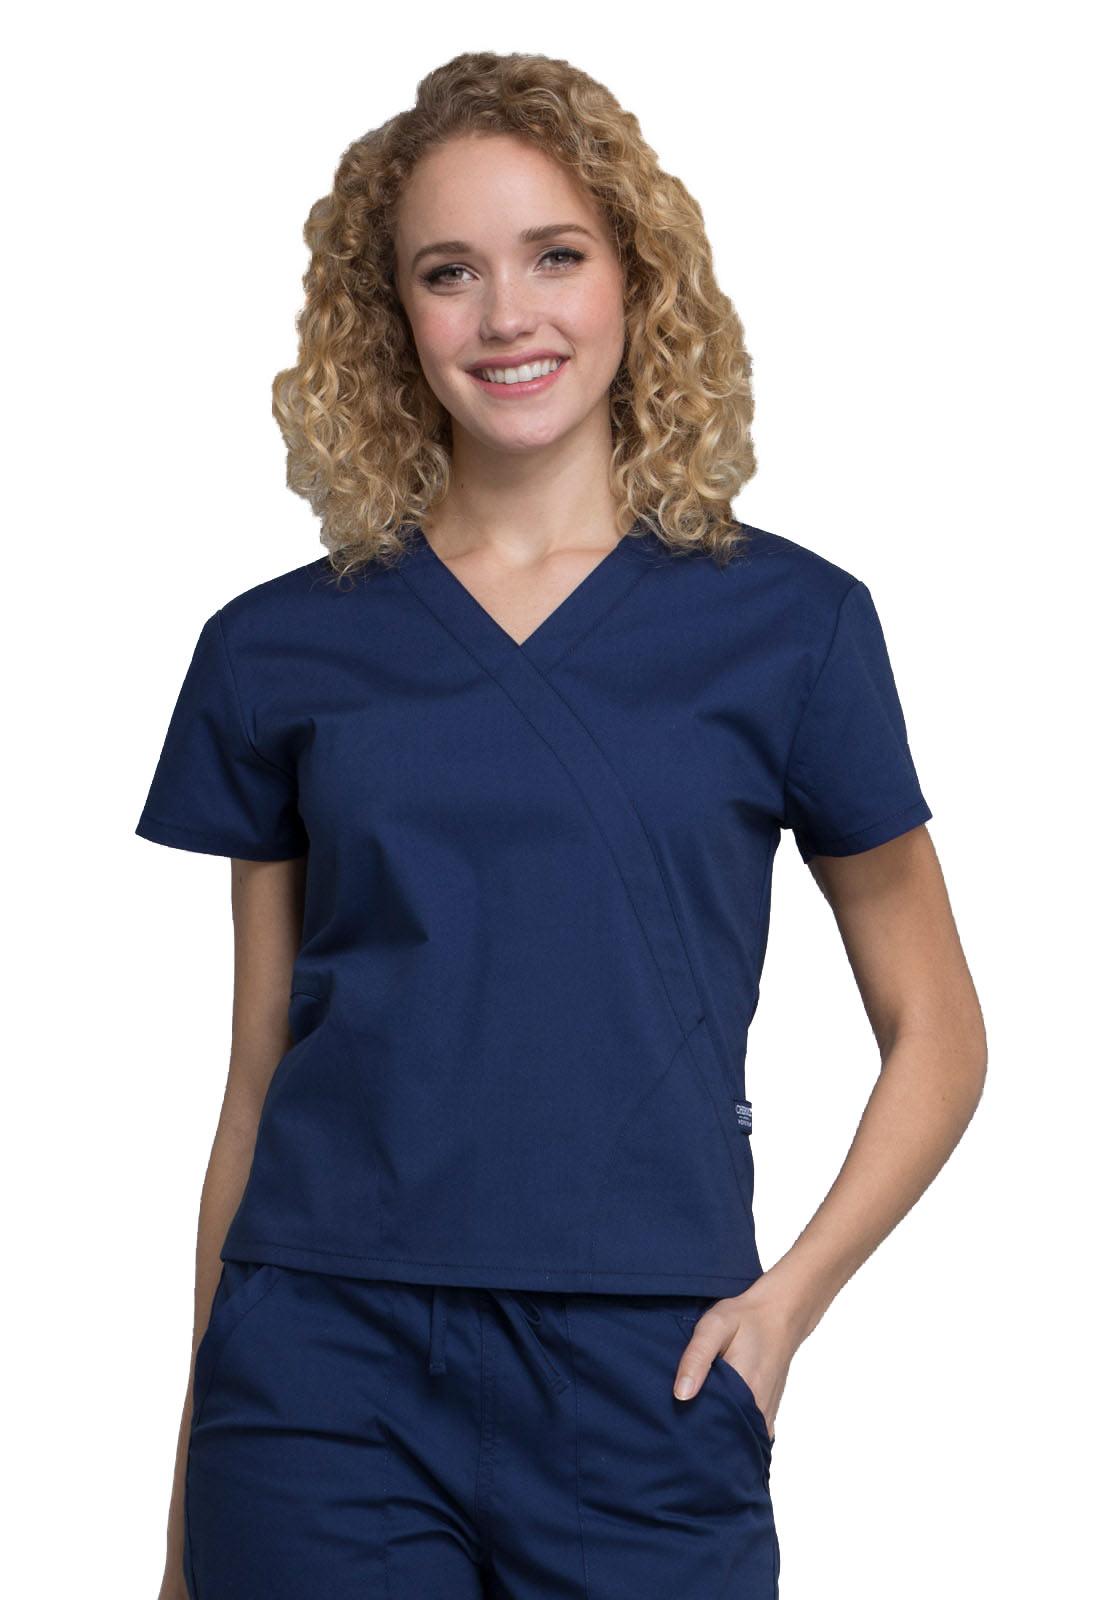 Dresses Womens Scrubs Metro Uniforms Nursing Uniforms Wink